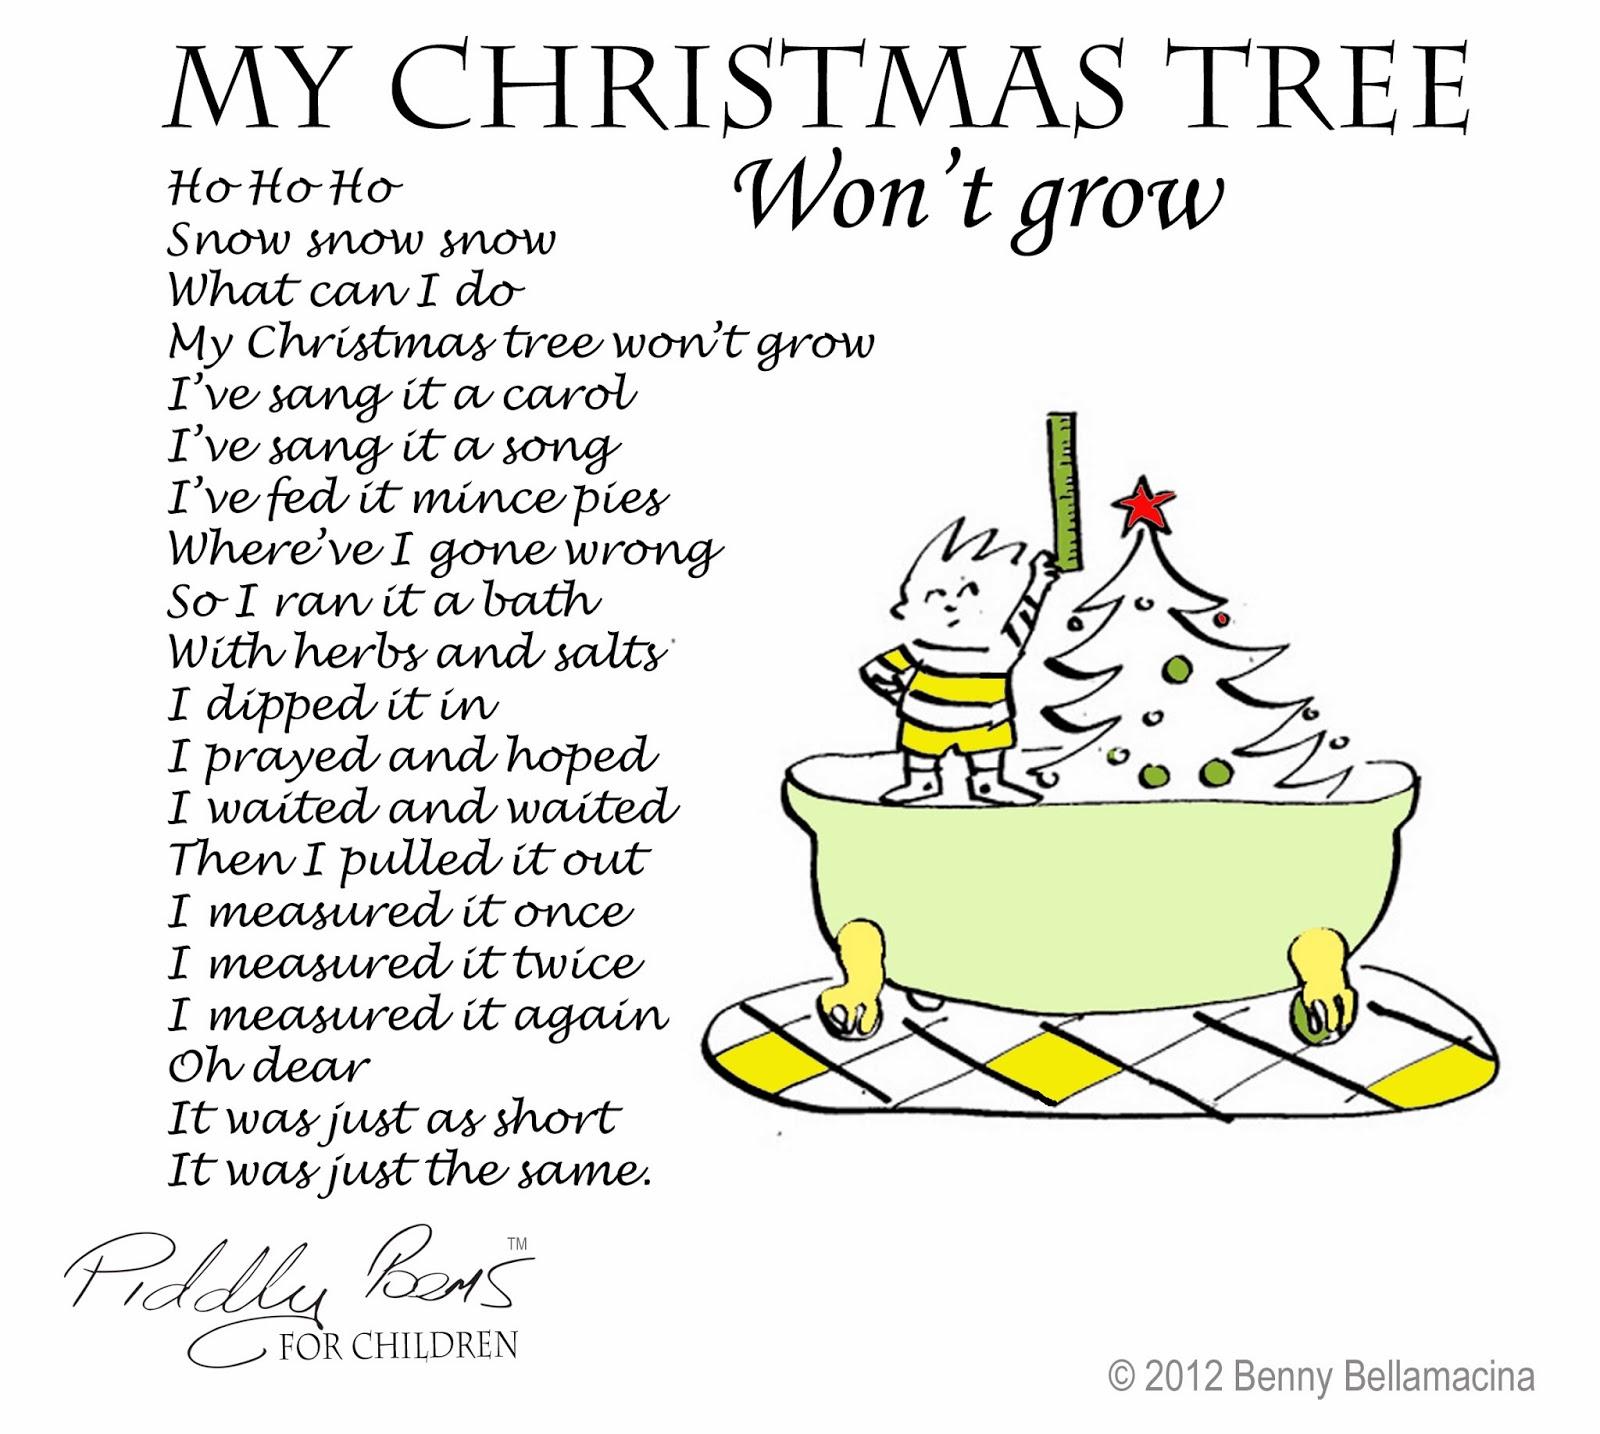 Funny poetry of teachers